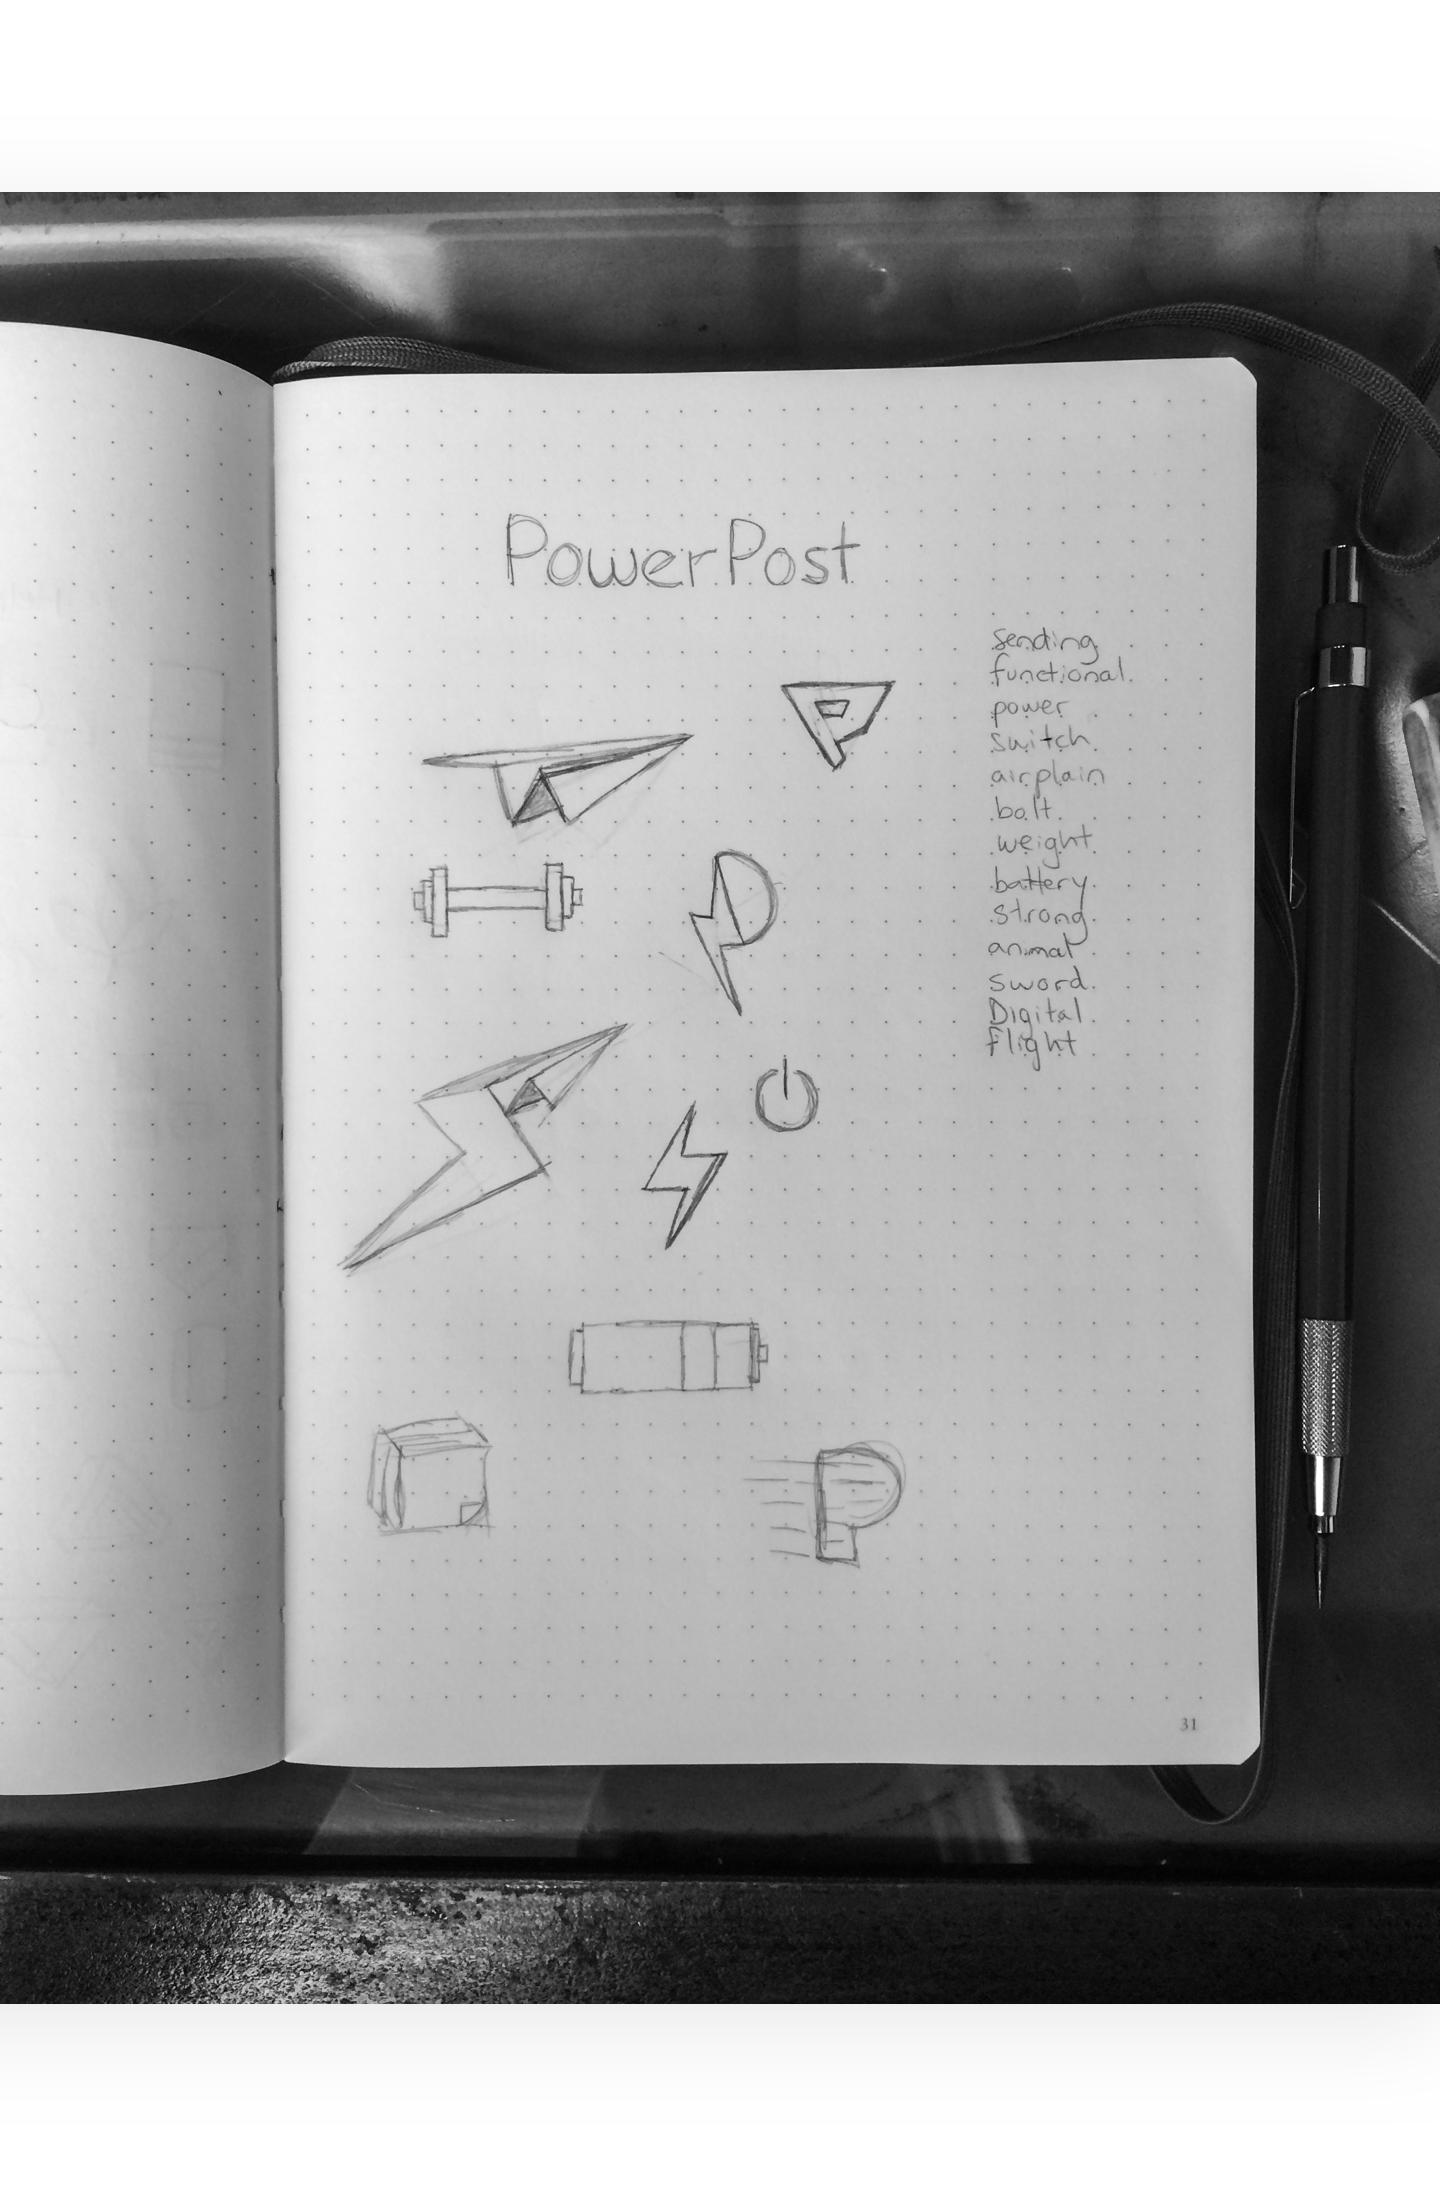 3b - Sketch